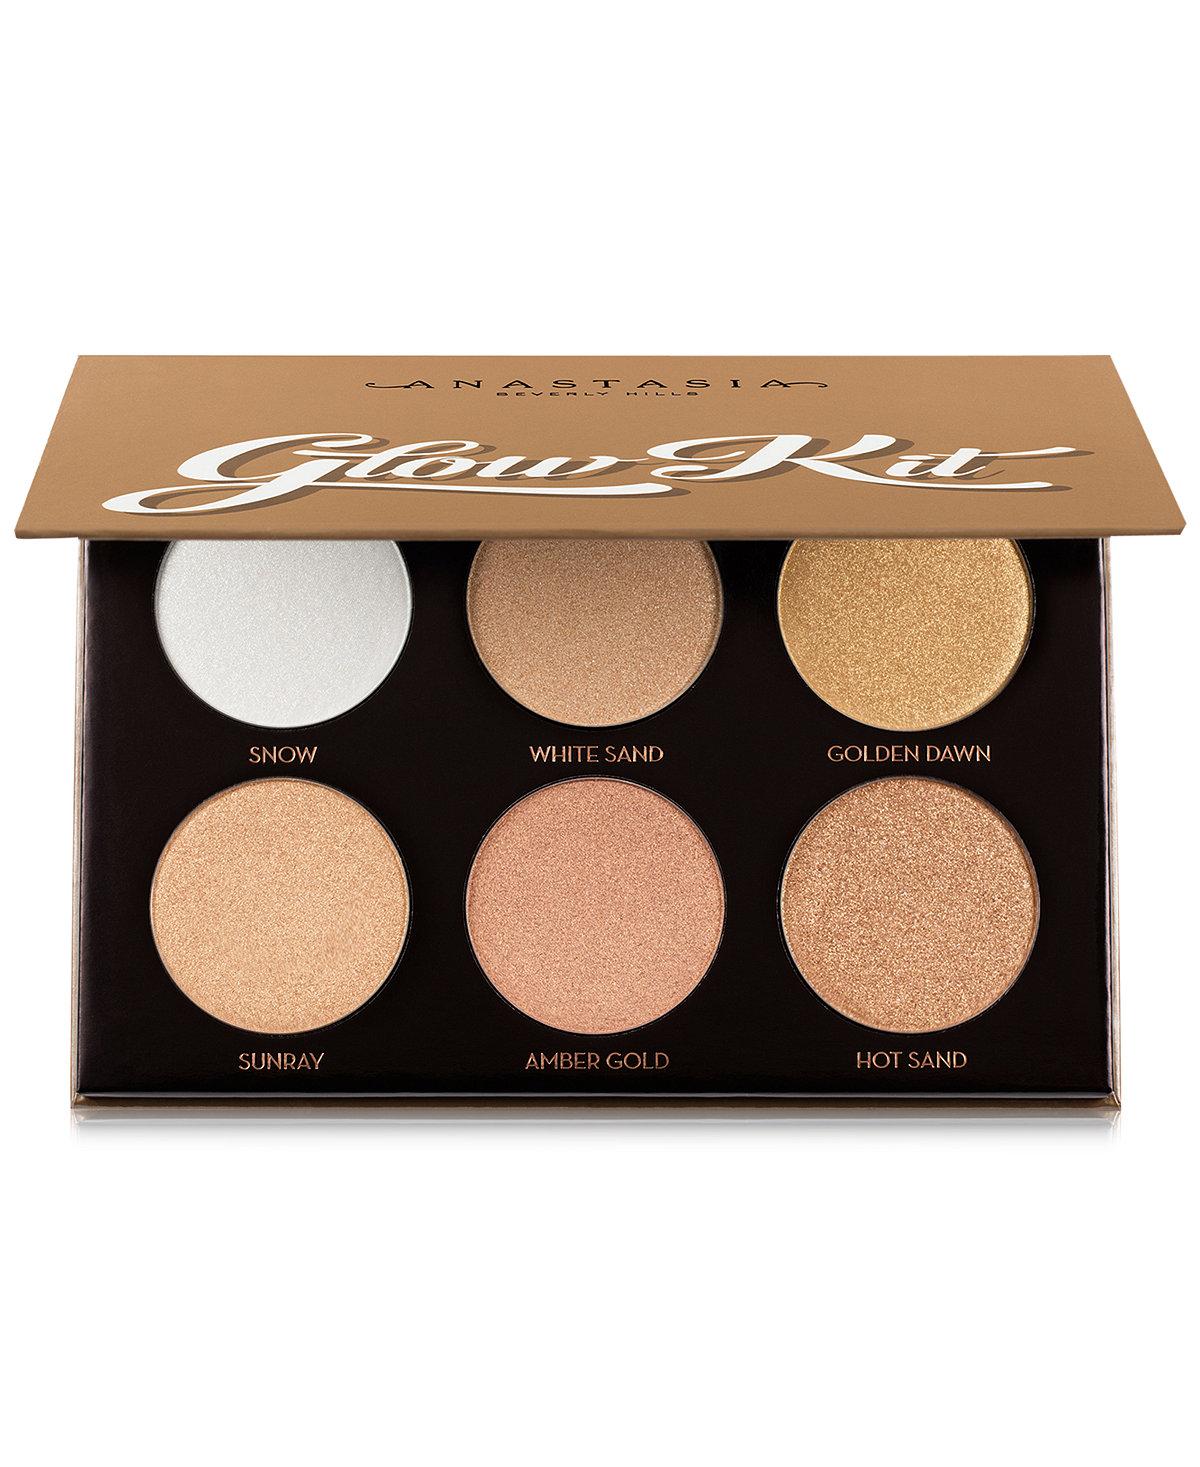 Anastasia Beverly Hills Ultimate Glow Kit $22.50 + Free S/H + Free Gift